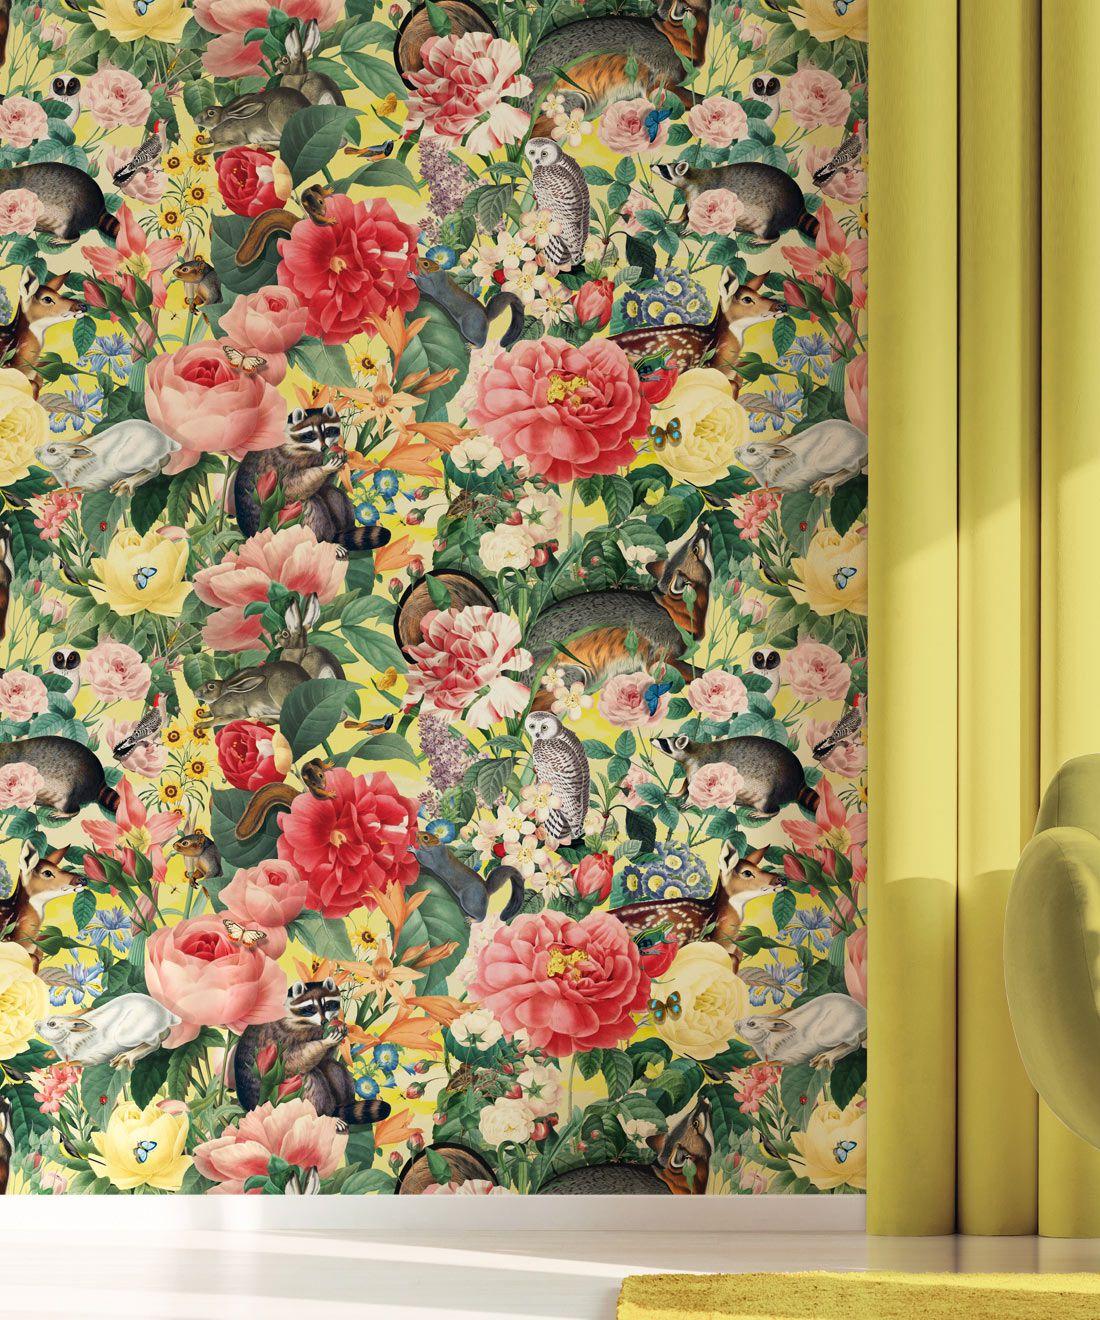 Bush Bouquet Spring Wallpaper • Lemon Colored Wallpaper • Assorted Color and Multi-color wallpaper • Floral Wallpaper • Wallpaper With Forest Animals • Insitu